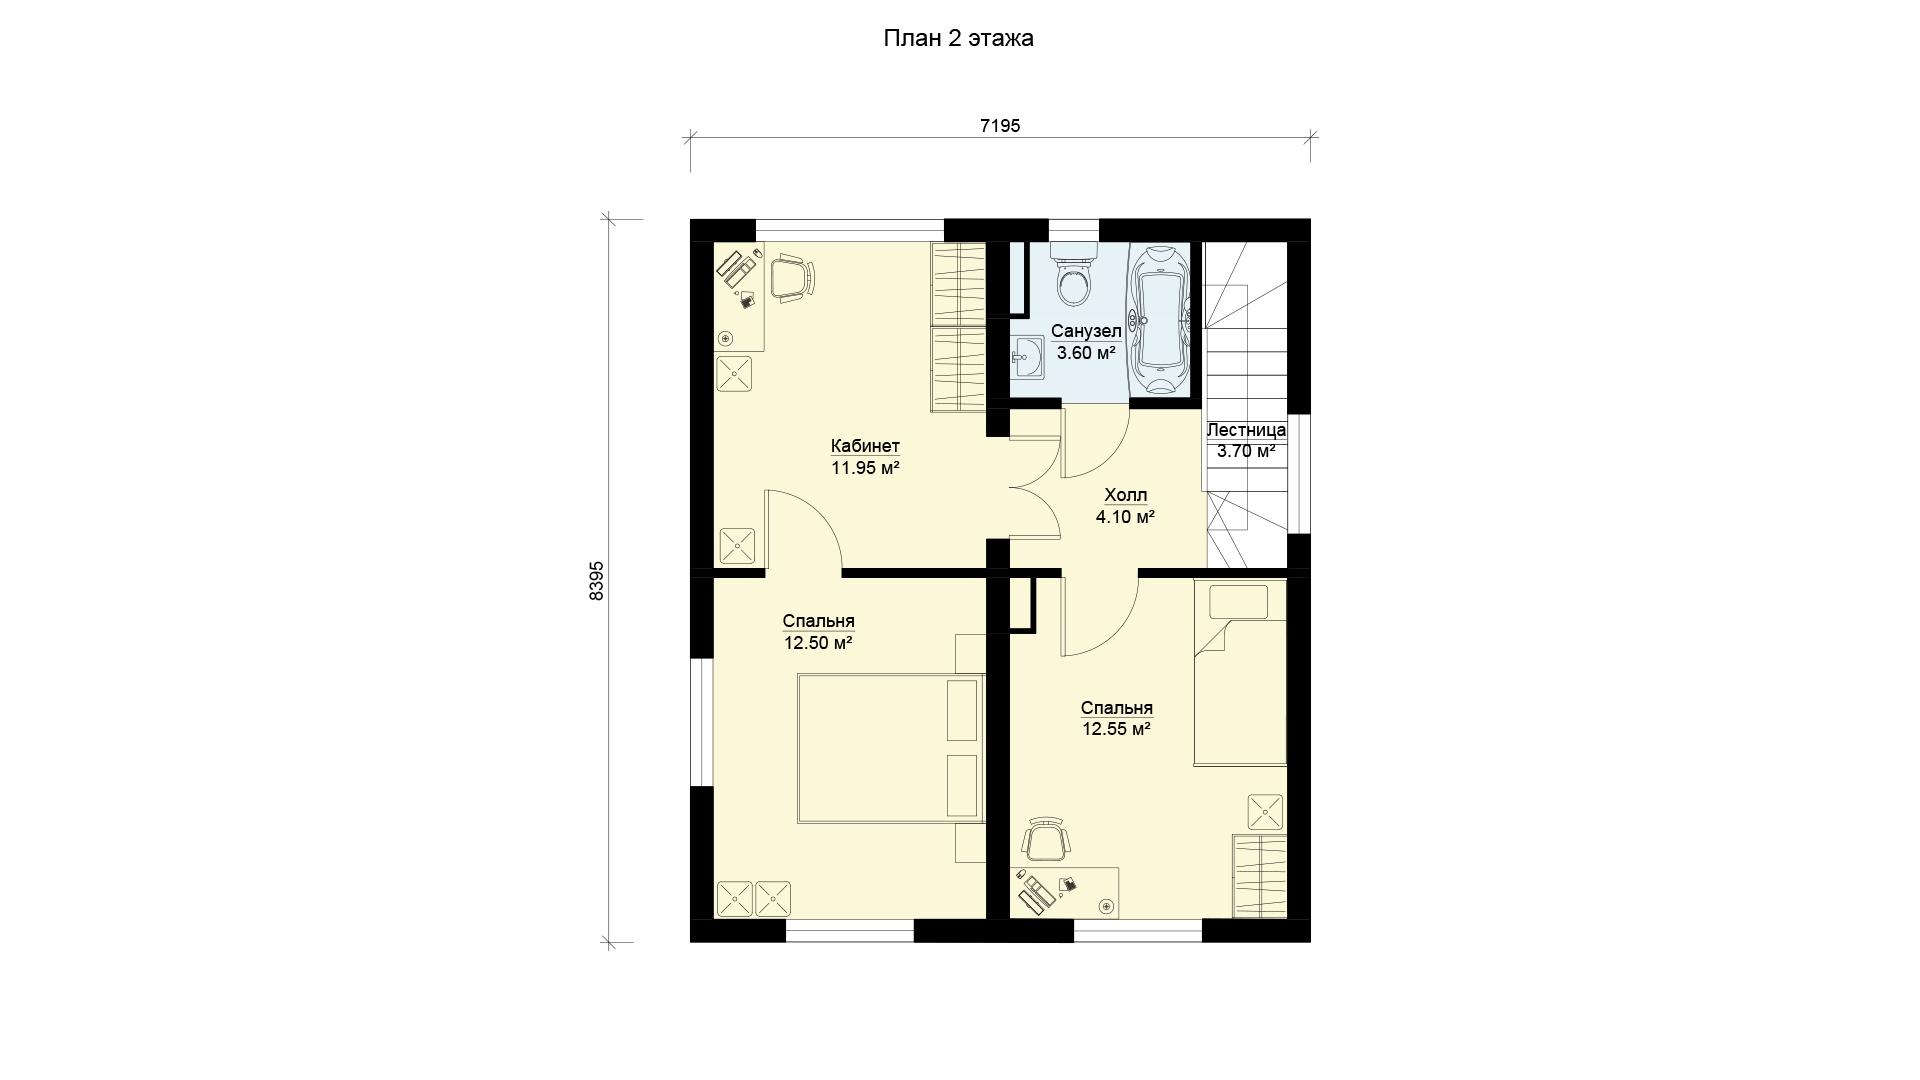 План второго этажа двухэтажного дома, проект БЭНПАН МС-97.